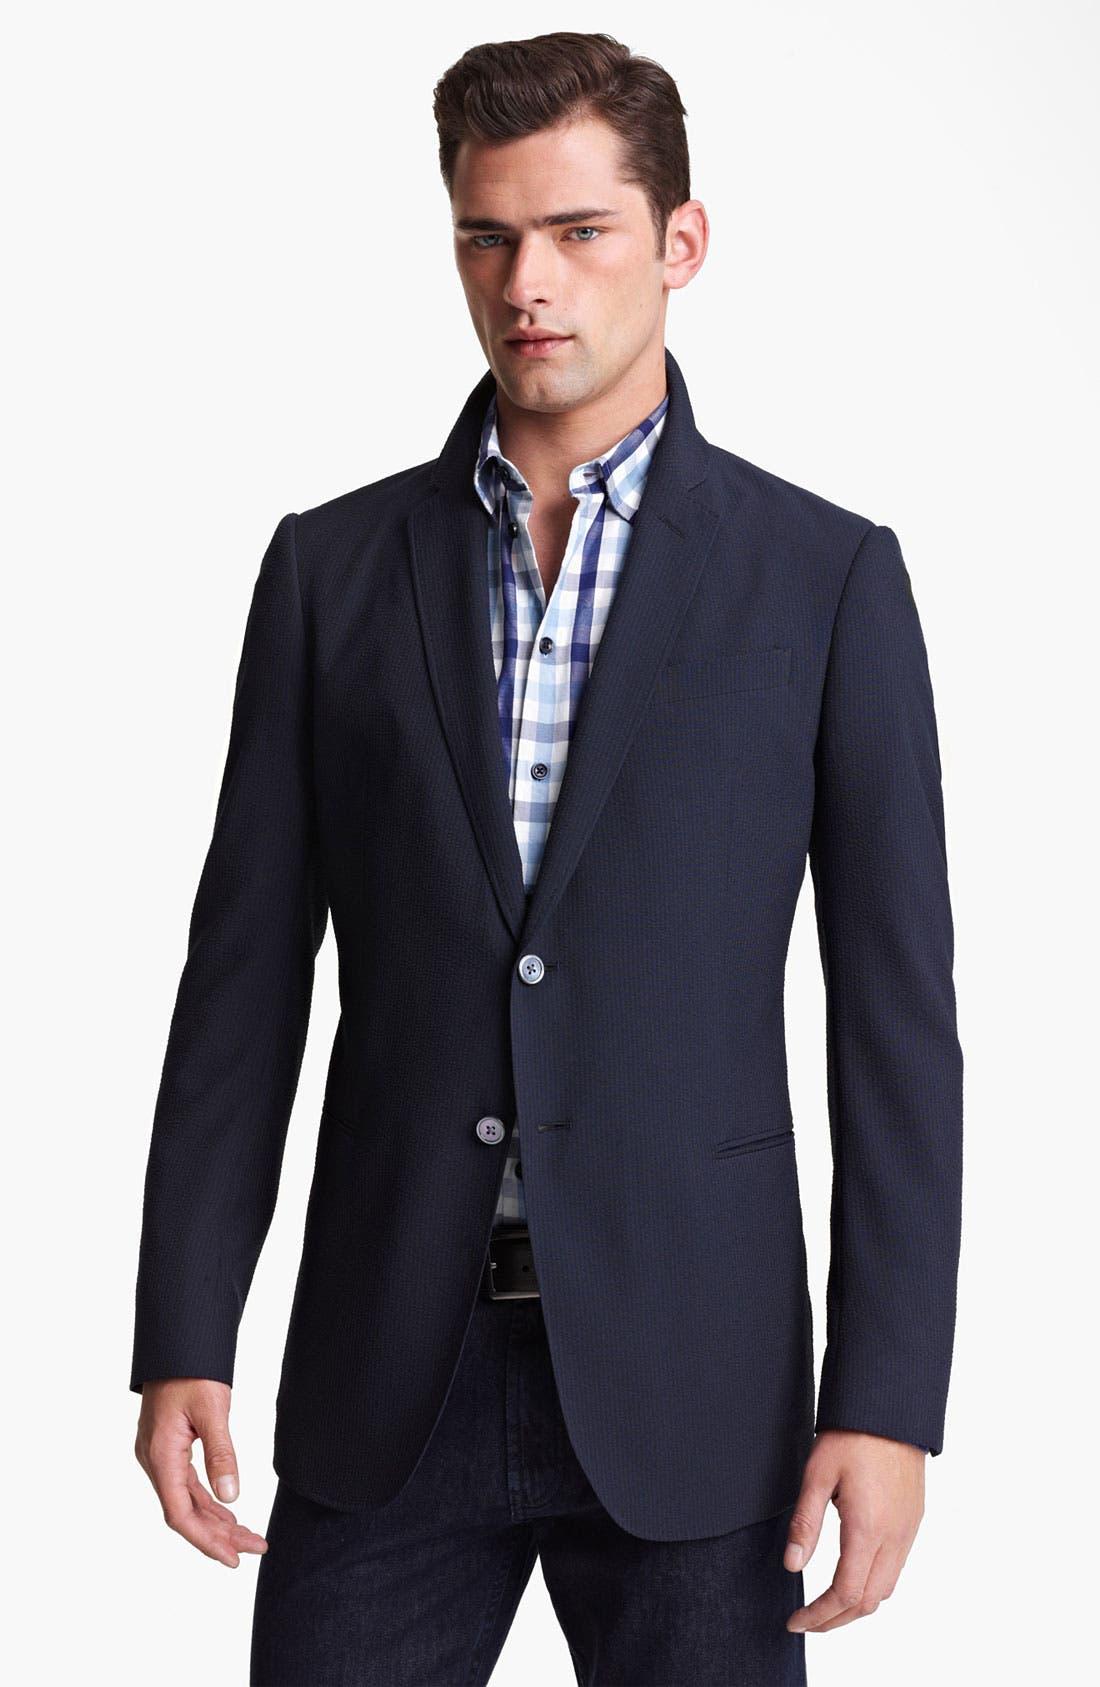 Alternate Image 1 Selected - Armani Collezioni Seersucker Sportcoat